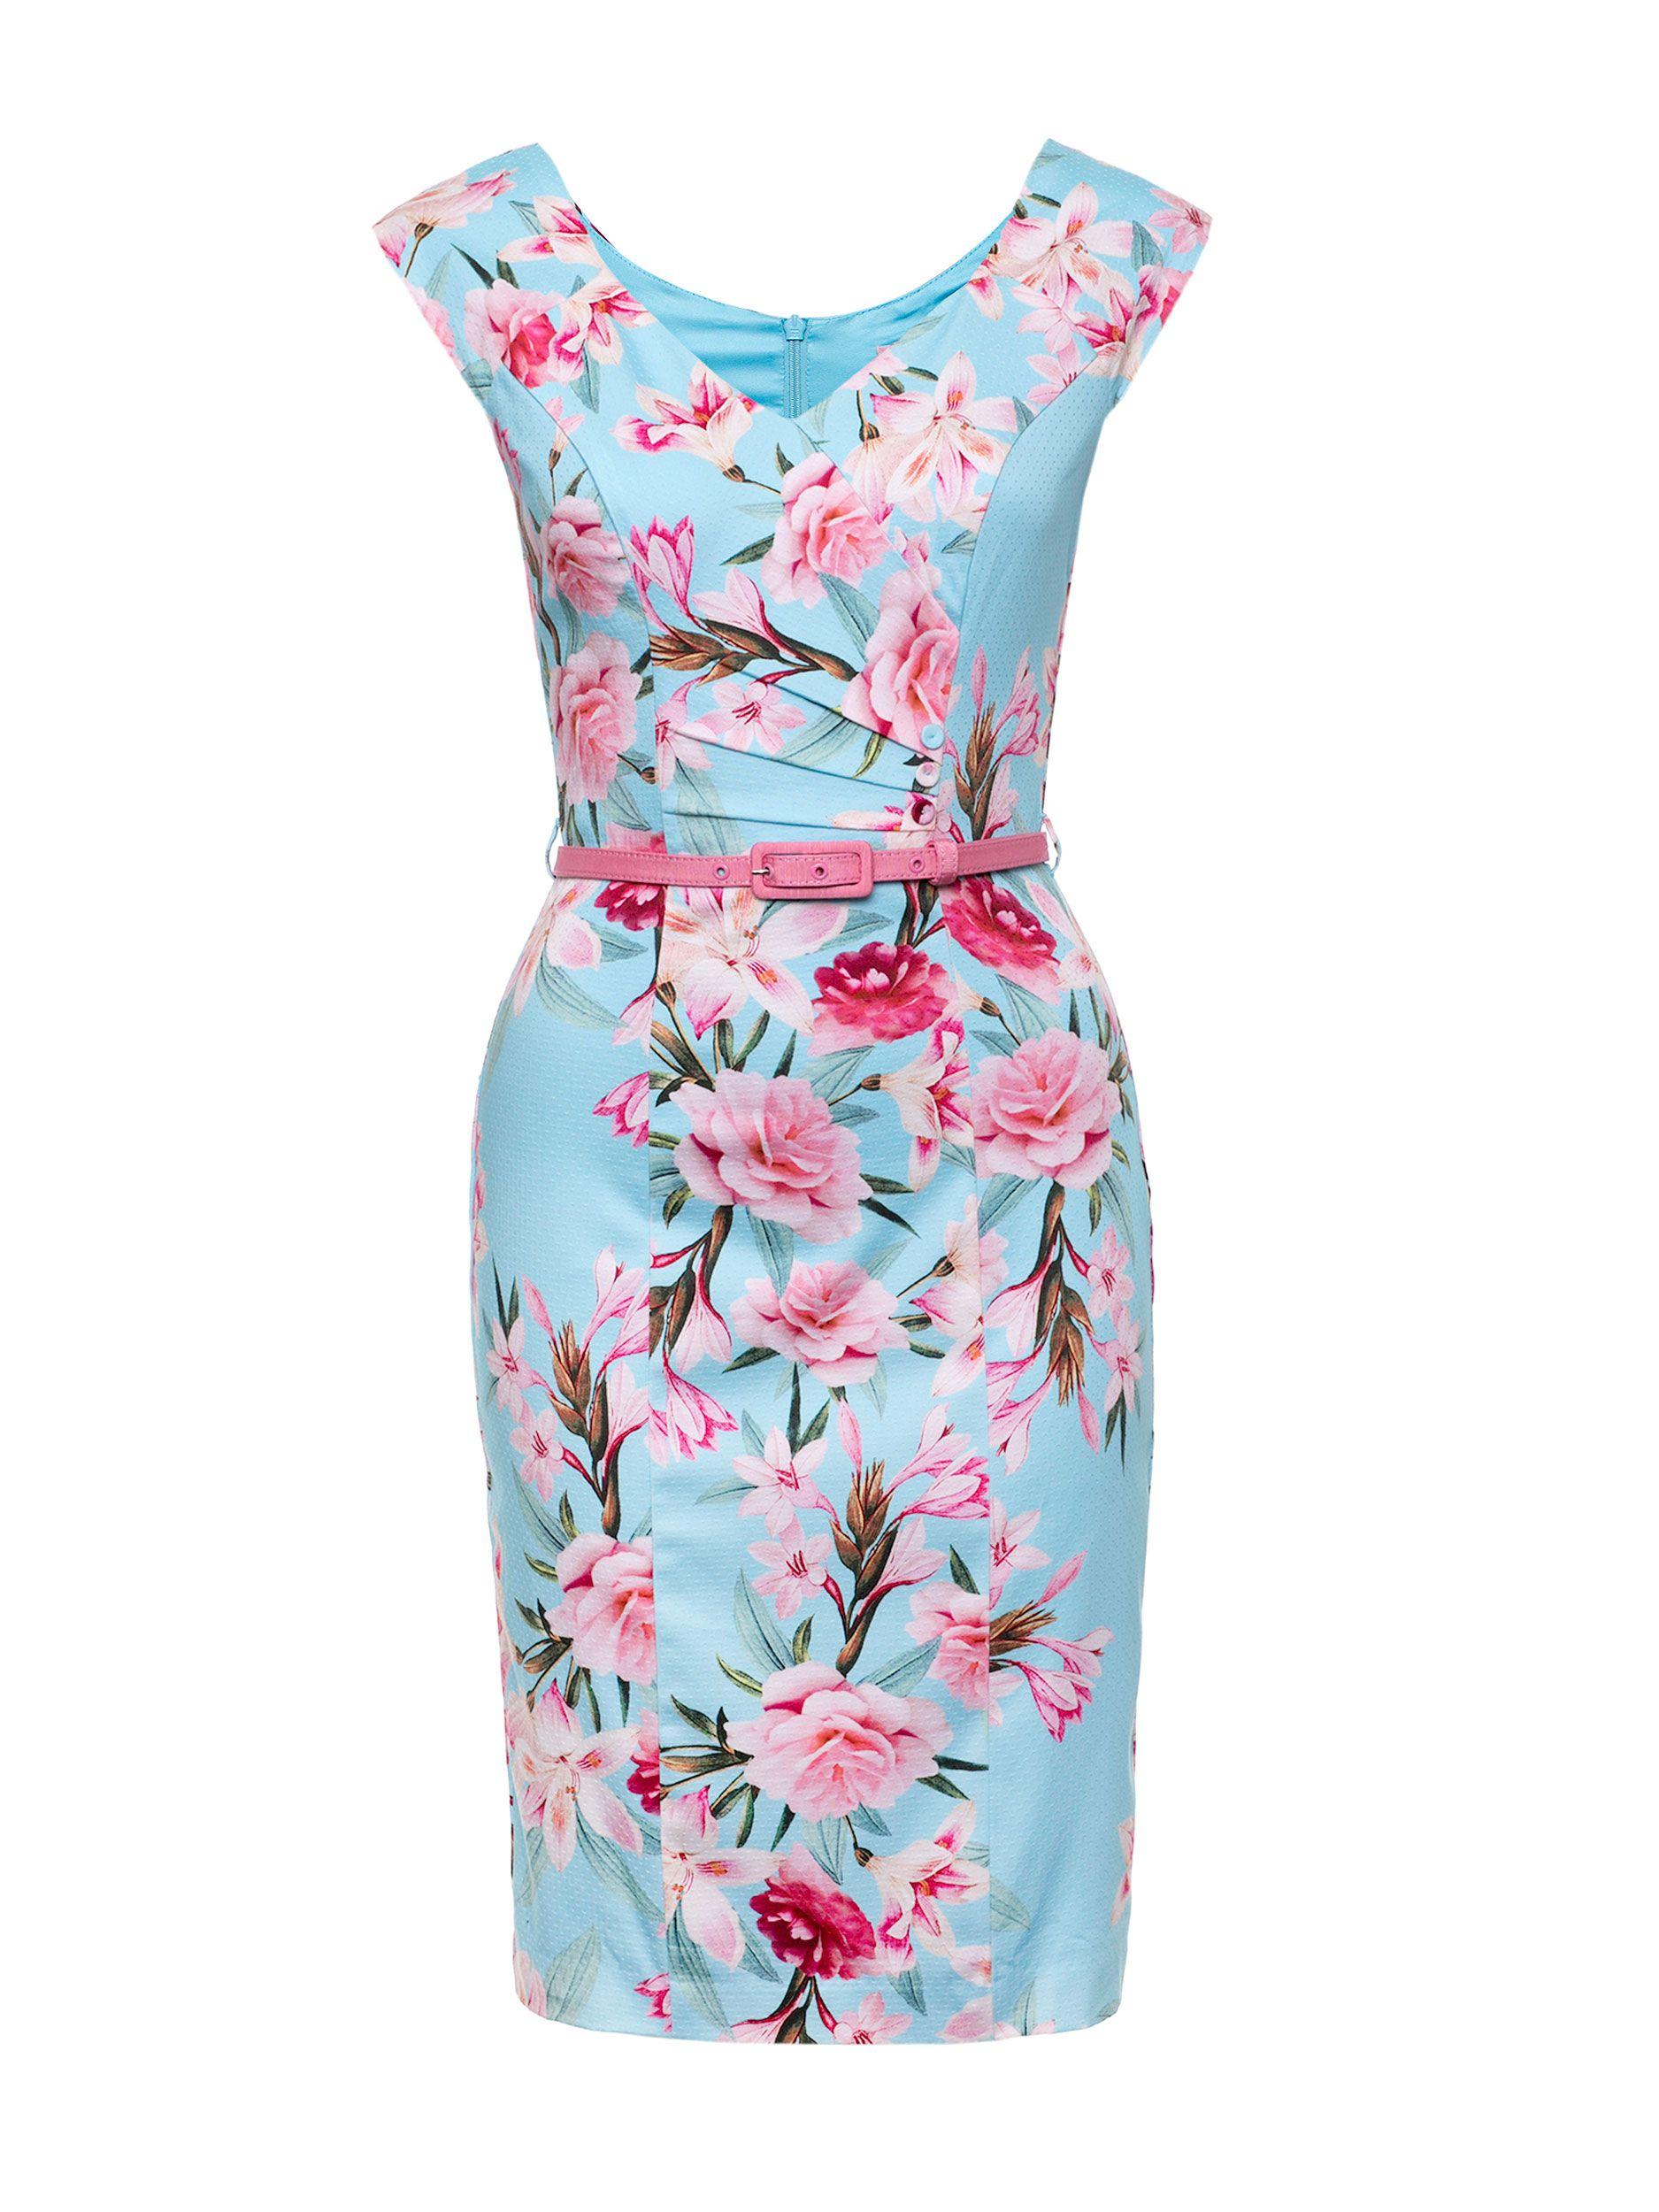 Blue apron australia - Pretty Marlow Dress Florals Review Australia